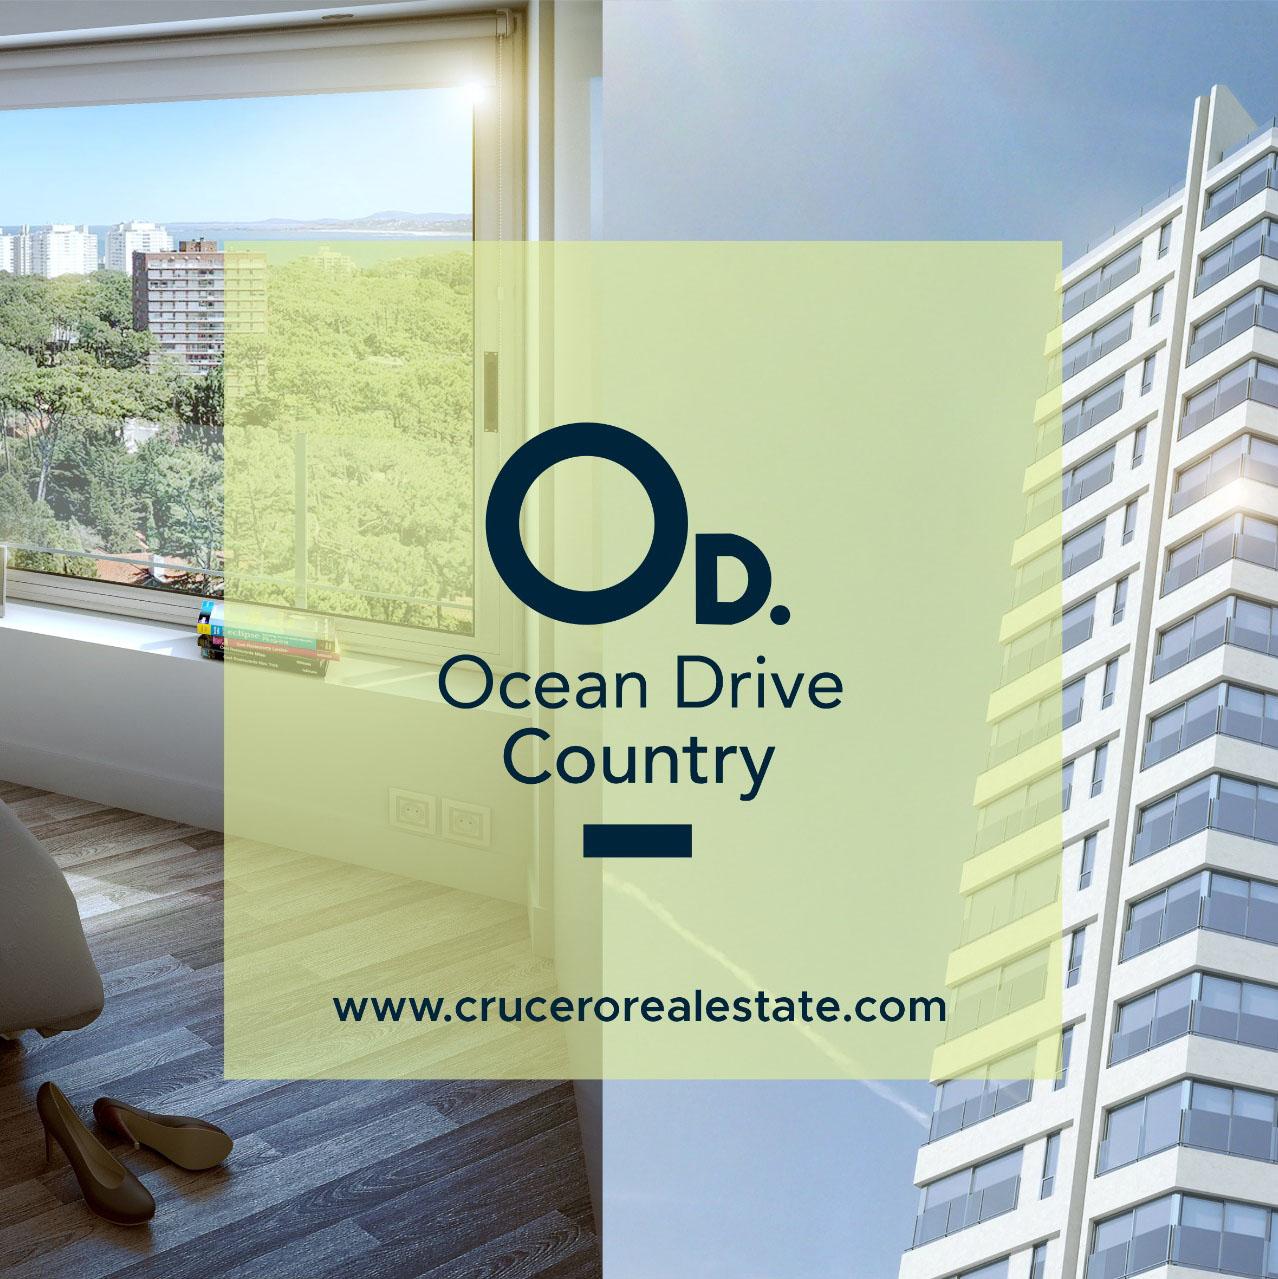 Ocean Drive Country